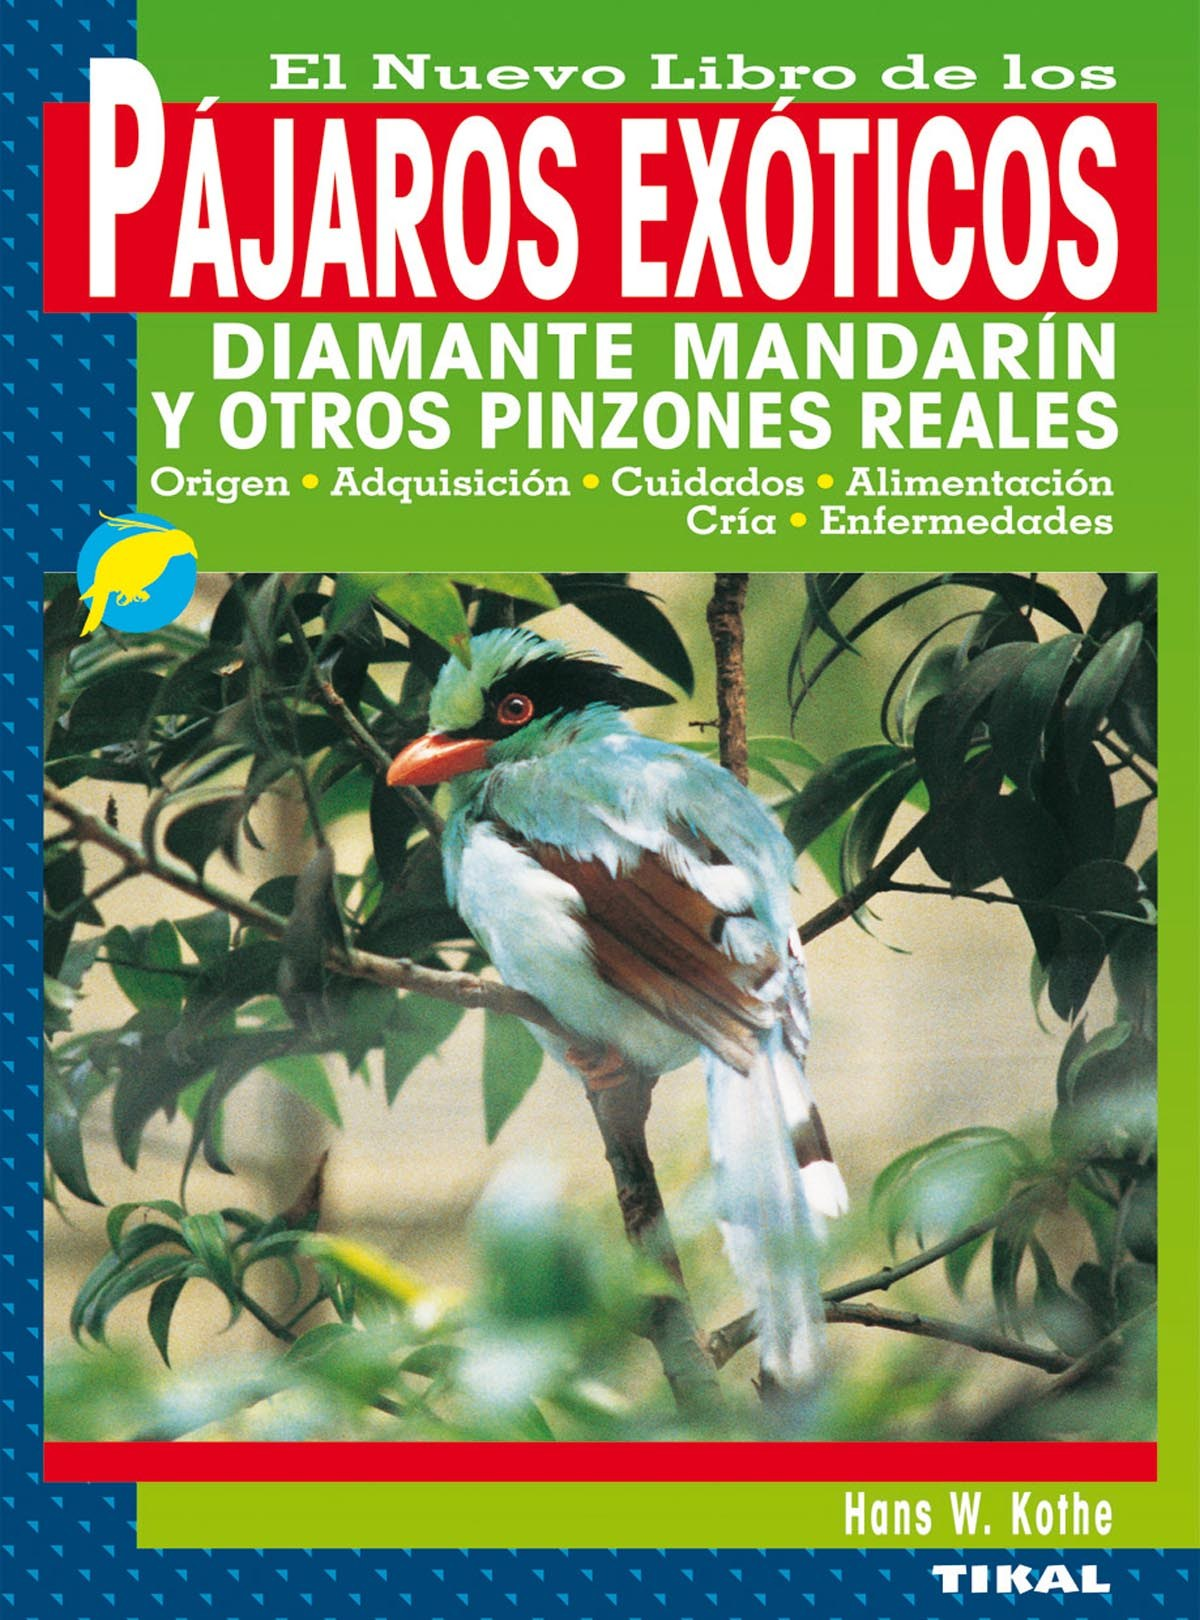 Pájaros exóticos 9788430532872